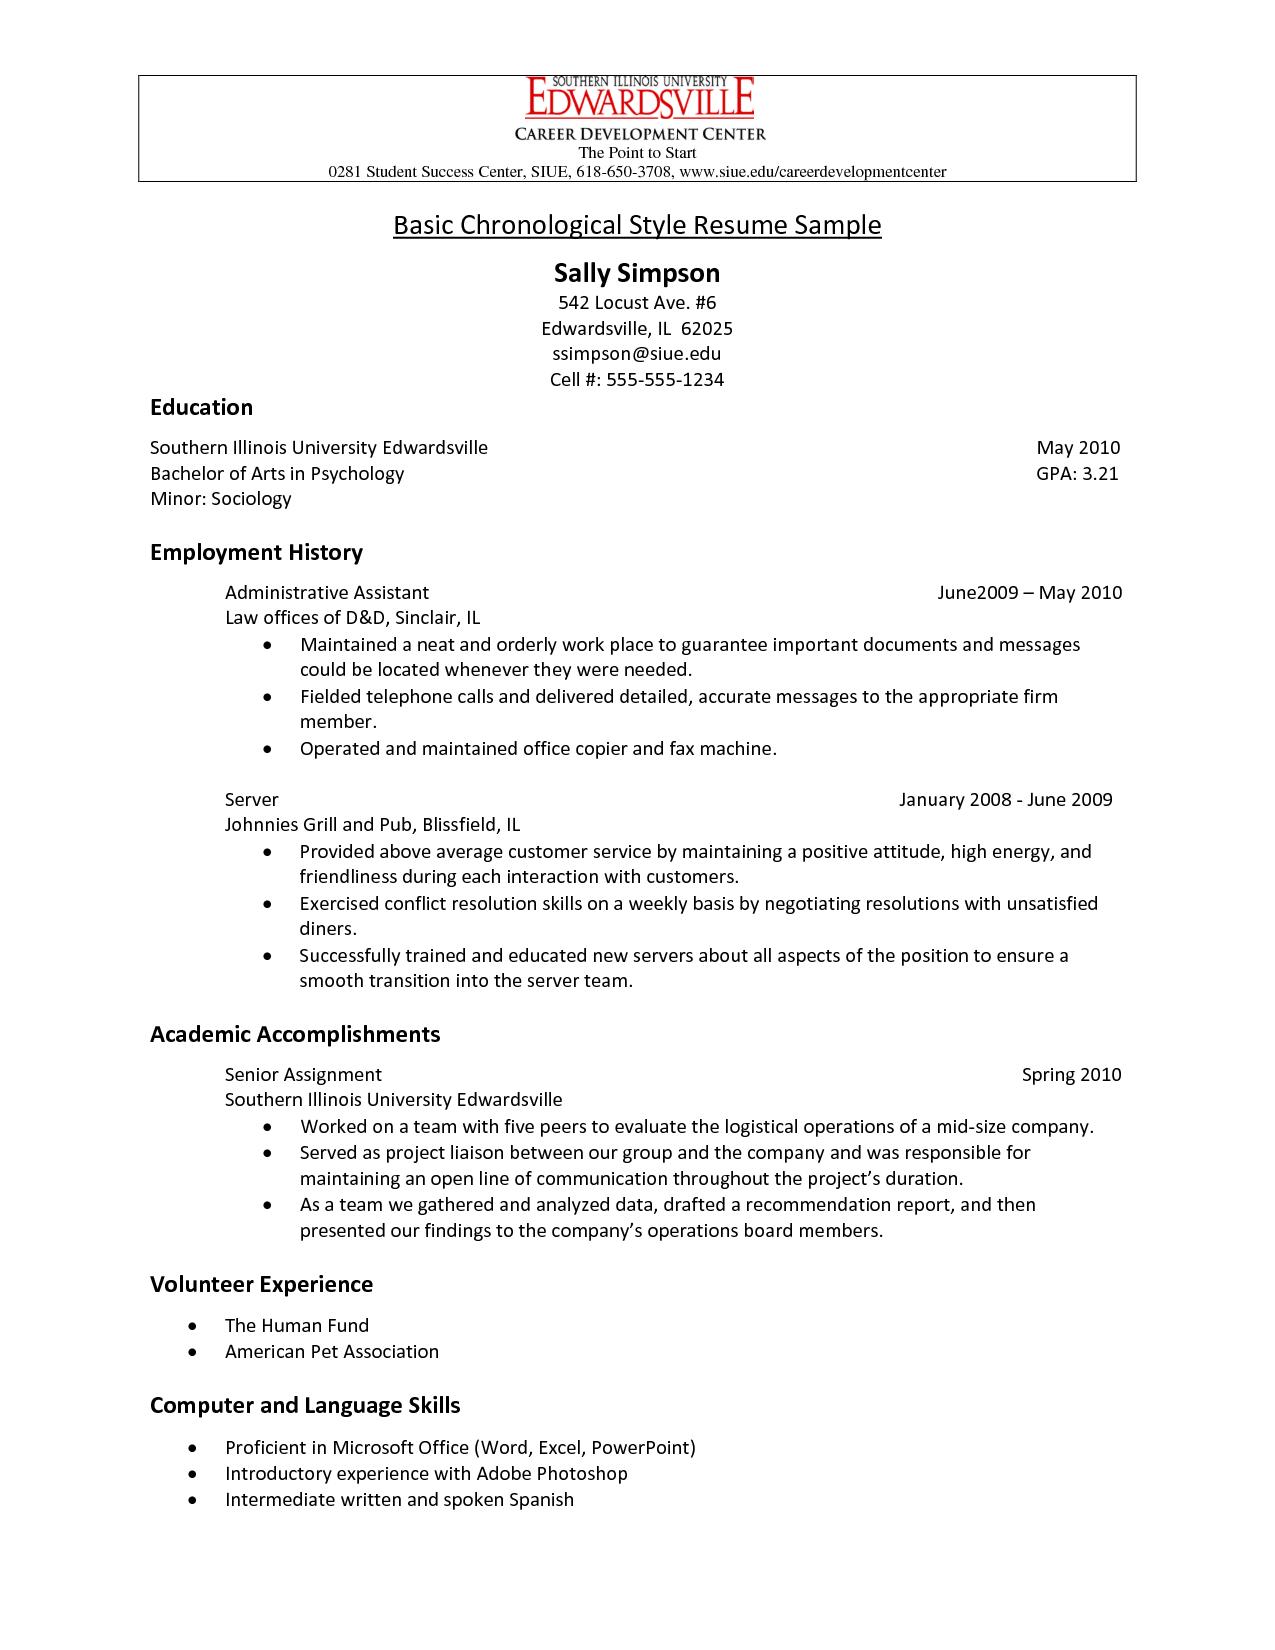 chronological resume samples pdf Google Search School